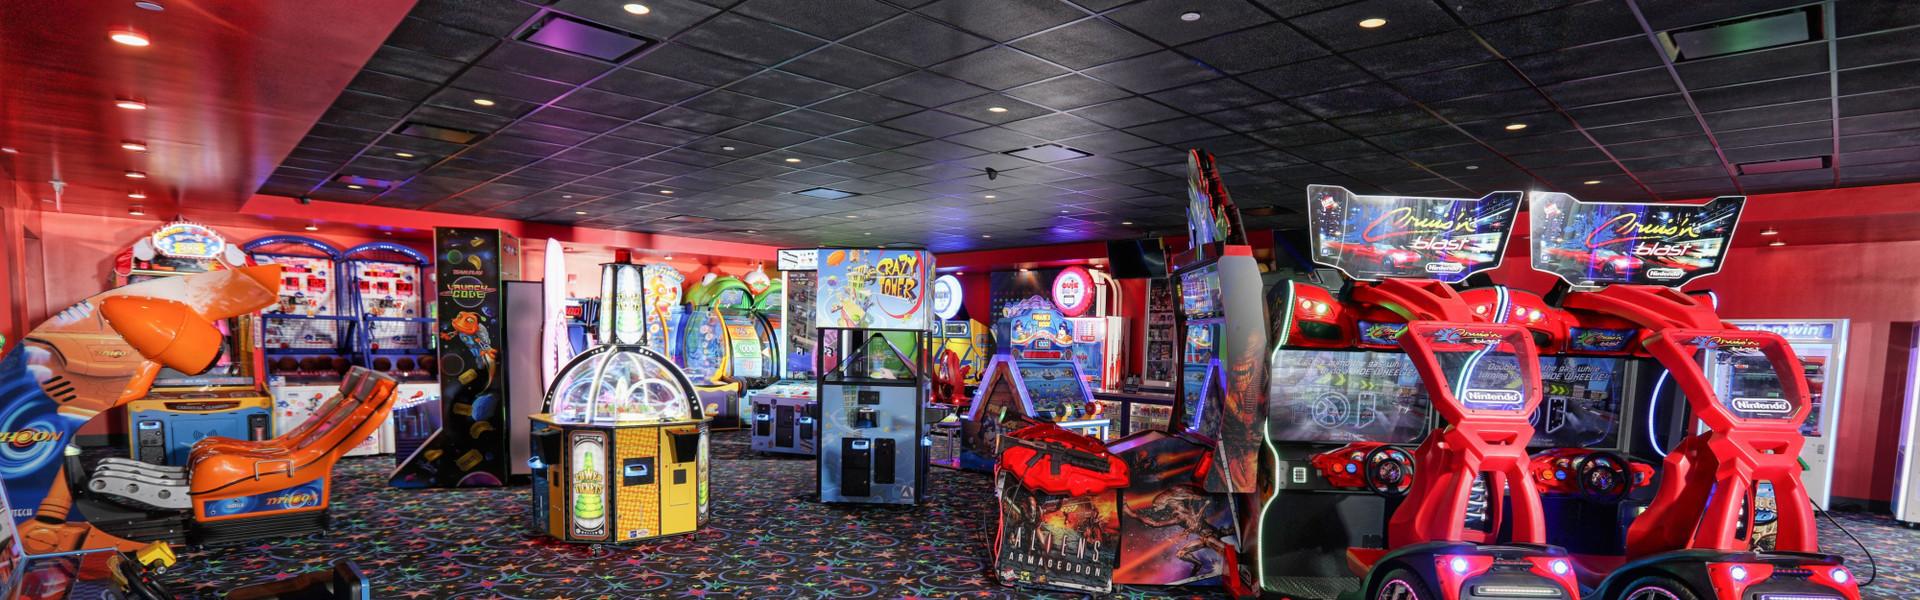 Child having fun at our game room in Orlando Florida   Orlando Resort Game Rooms   Westgate Lakes Resort & Spa